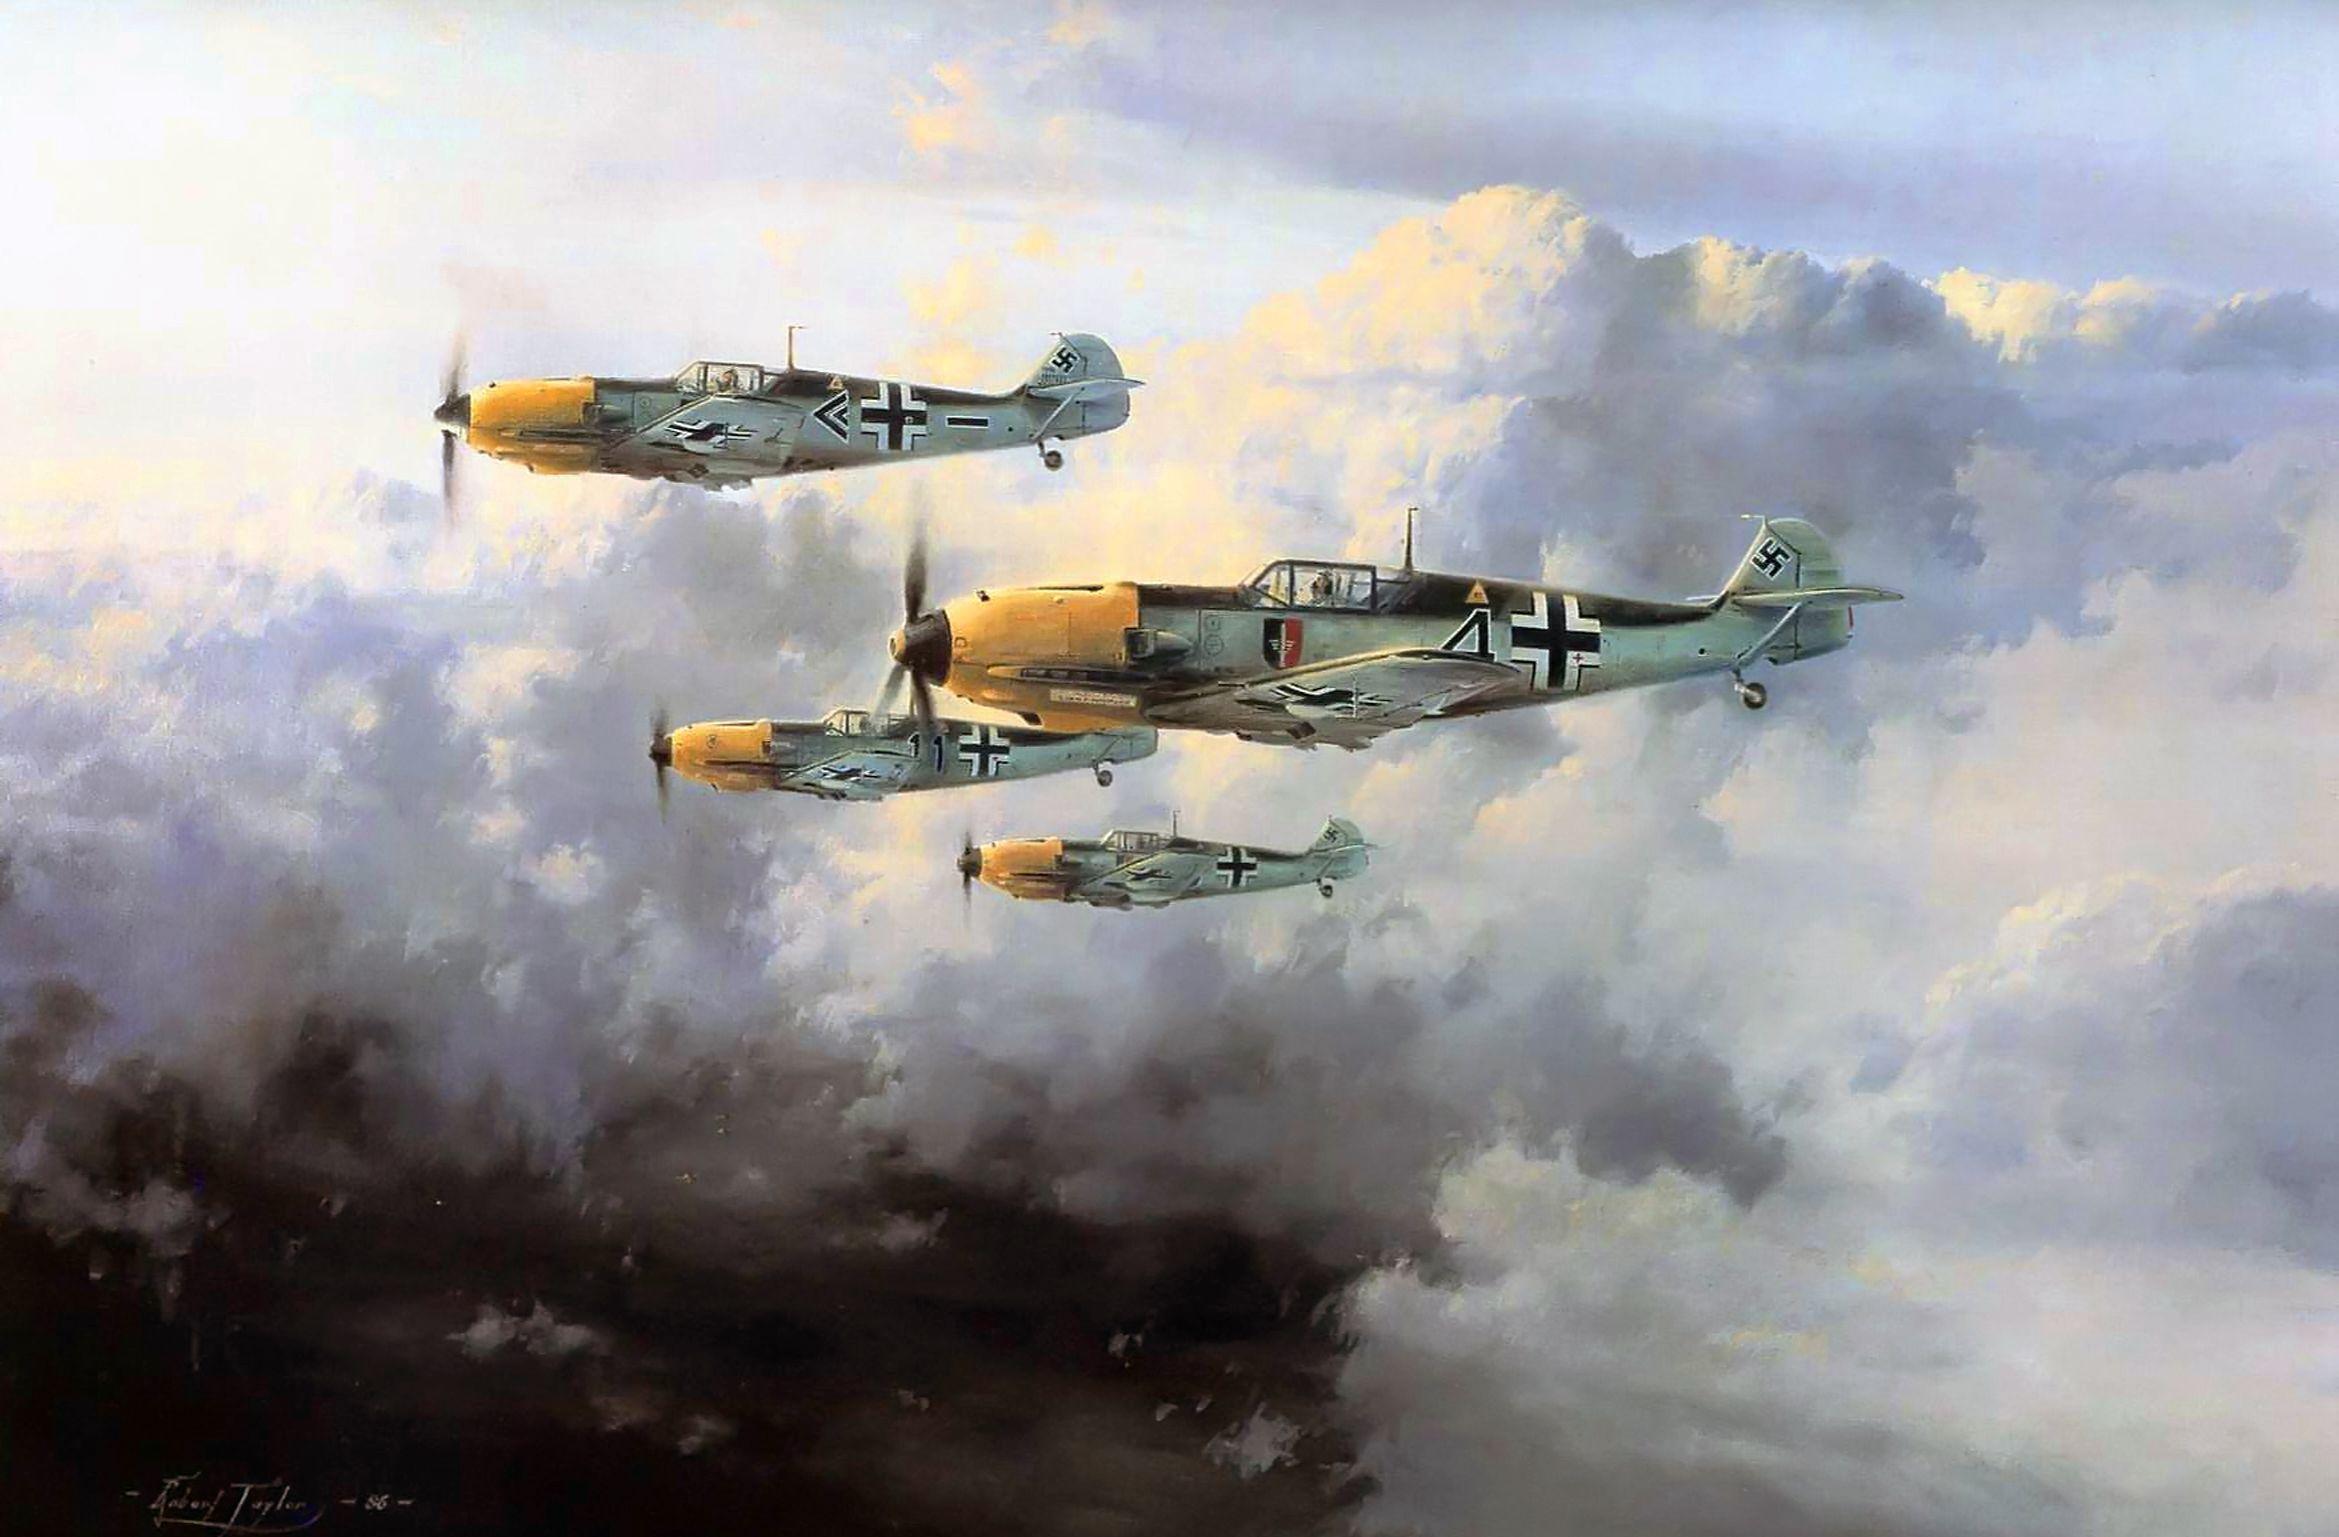 Jg 52 By Robert Taylor Bf 109e Aviation Art Aviation